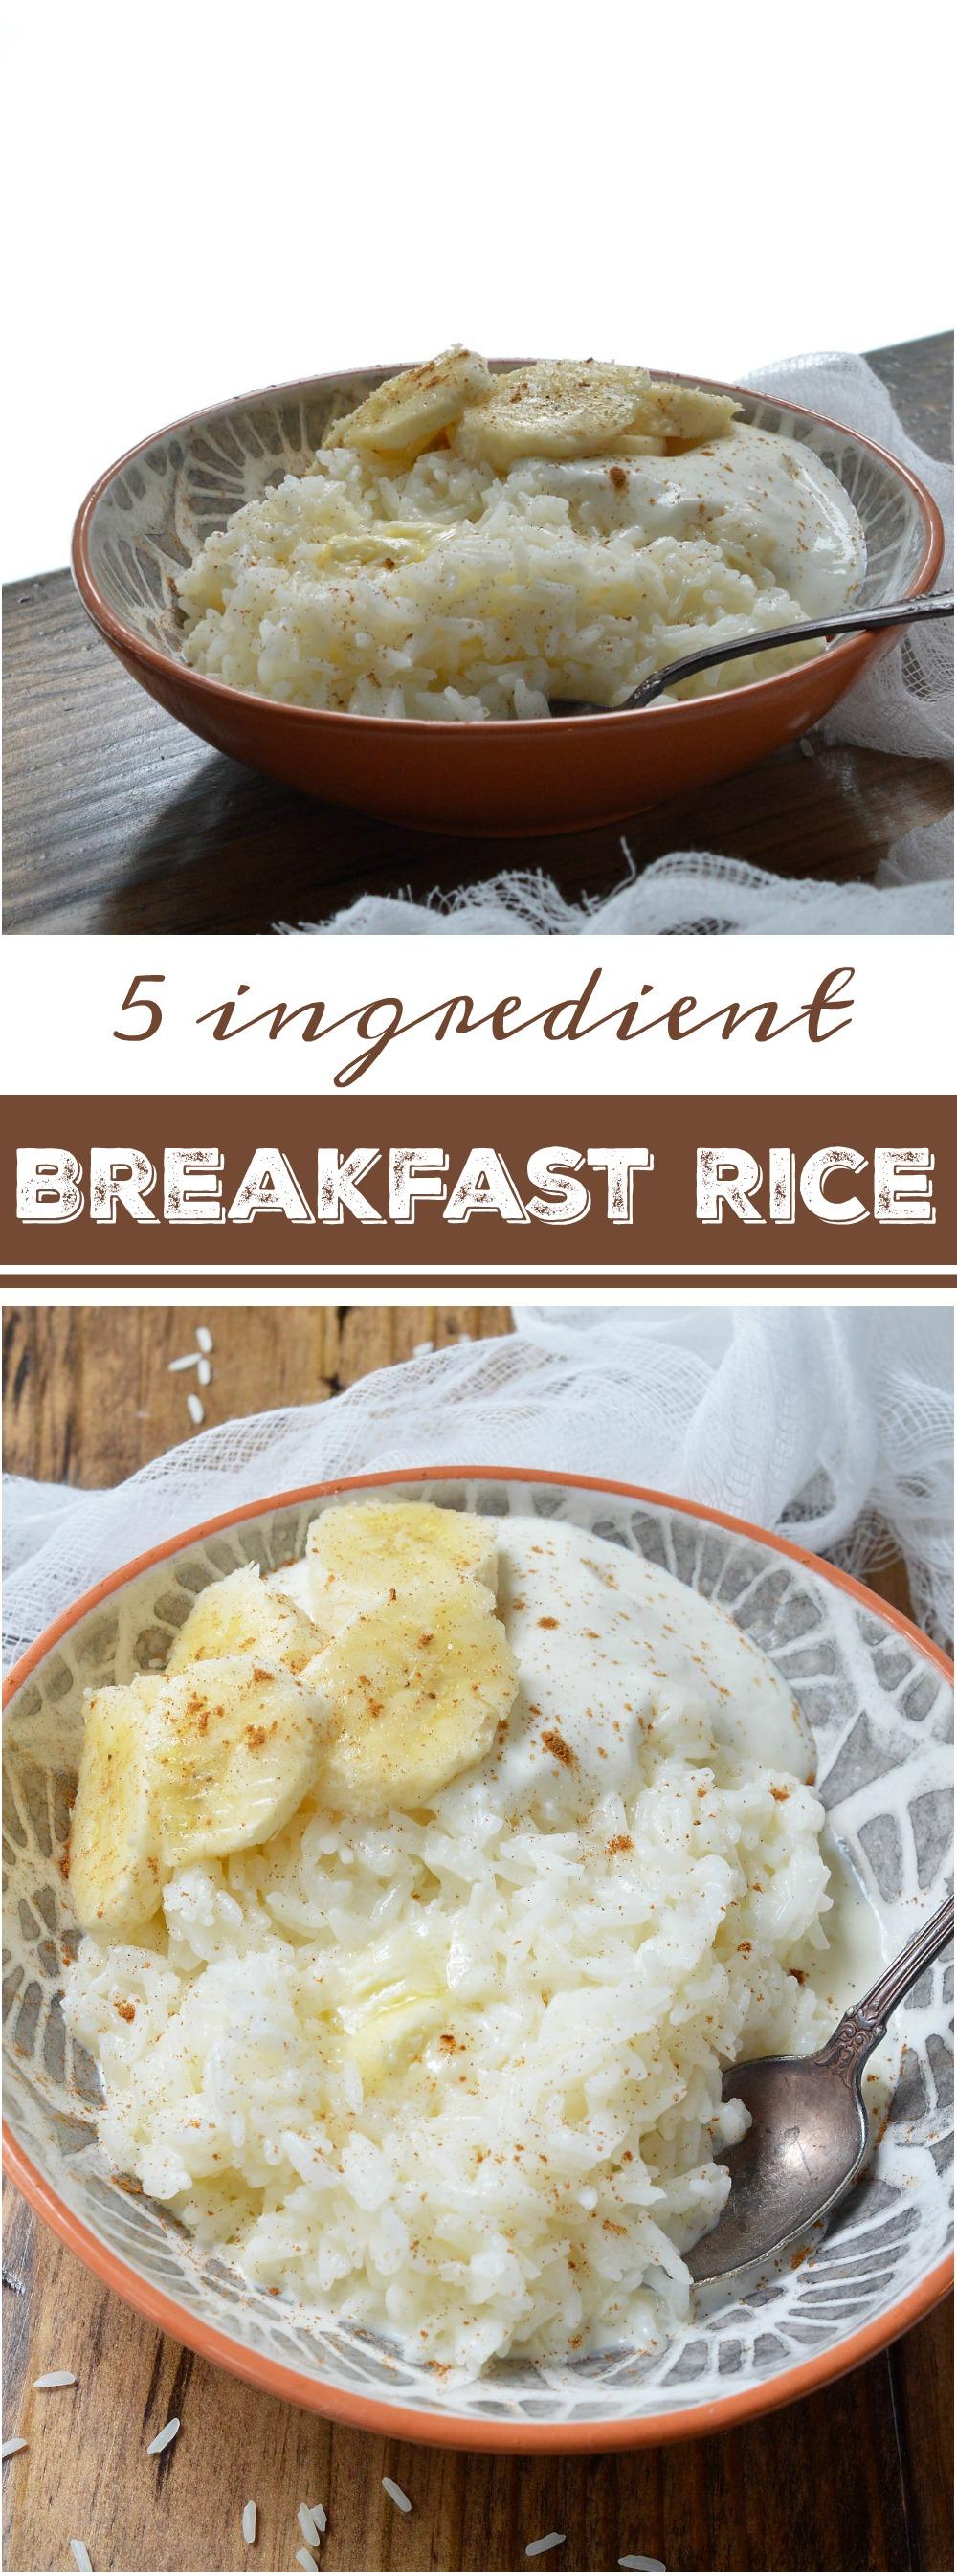 5 Ingredient Breakfast Rice - WonkyWonderful